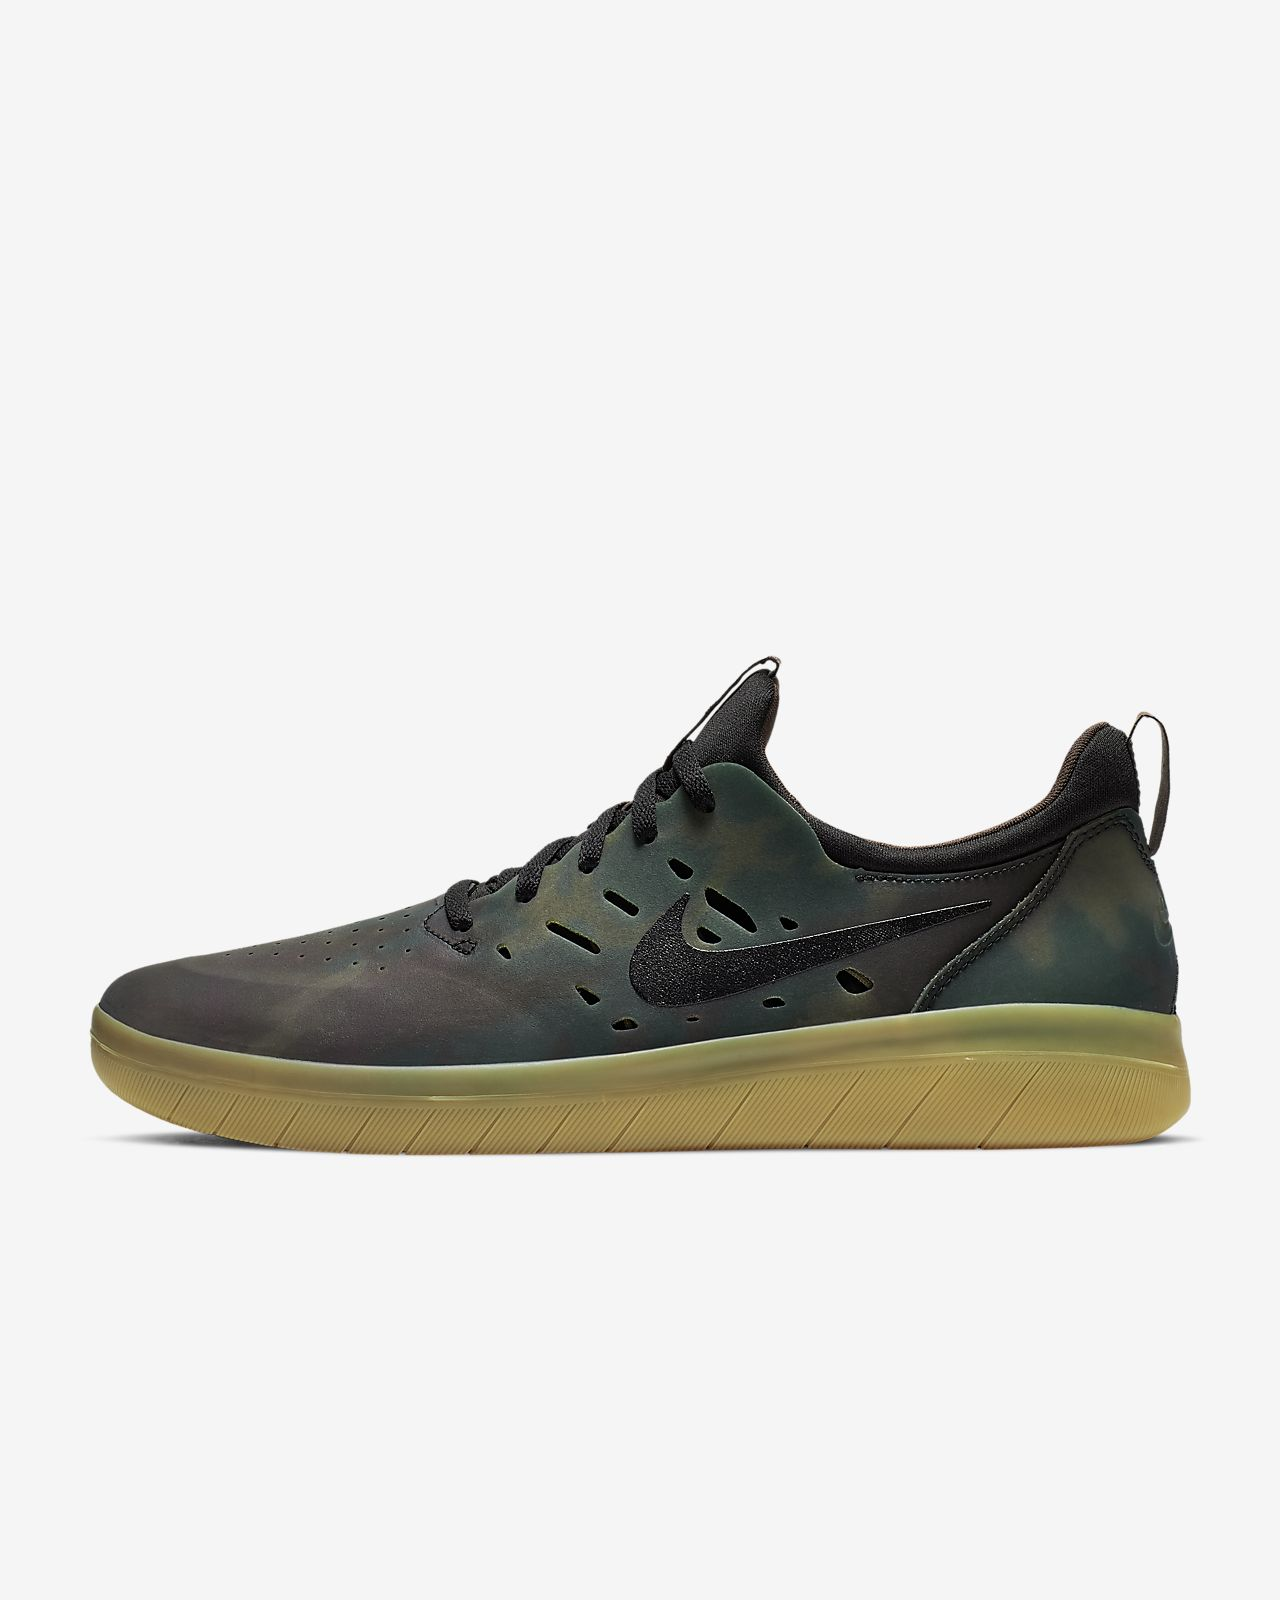 Skateboardsko Nike SB Nyjah Free Premium